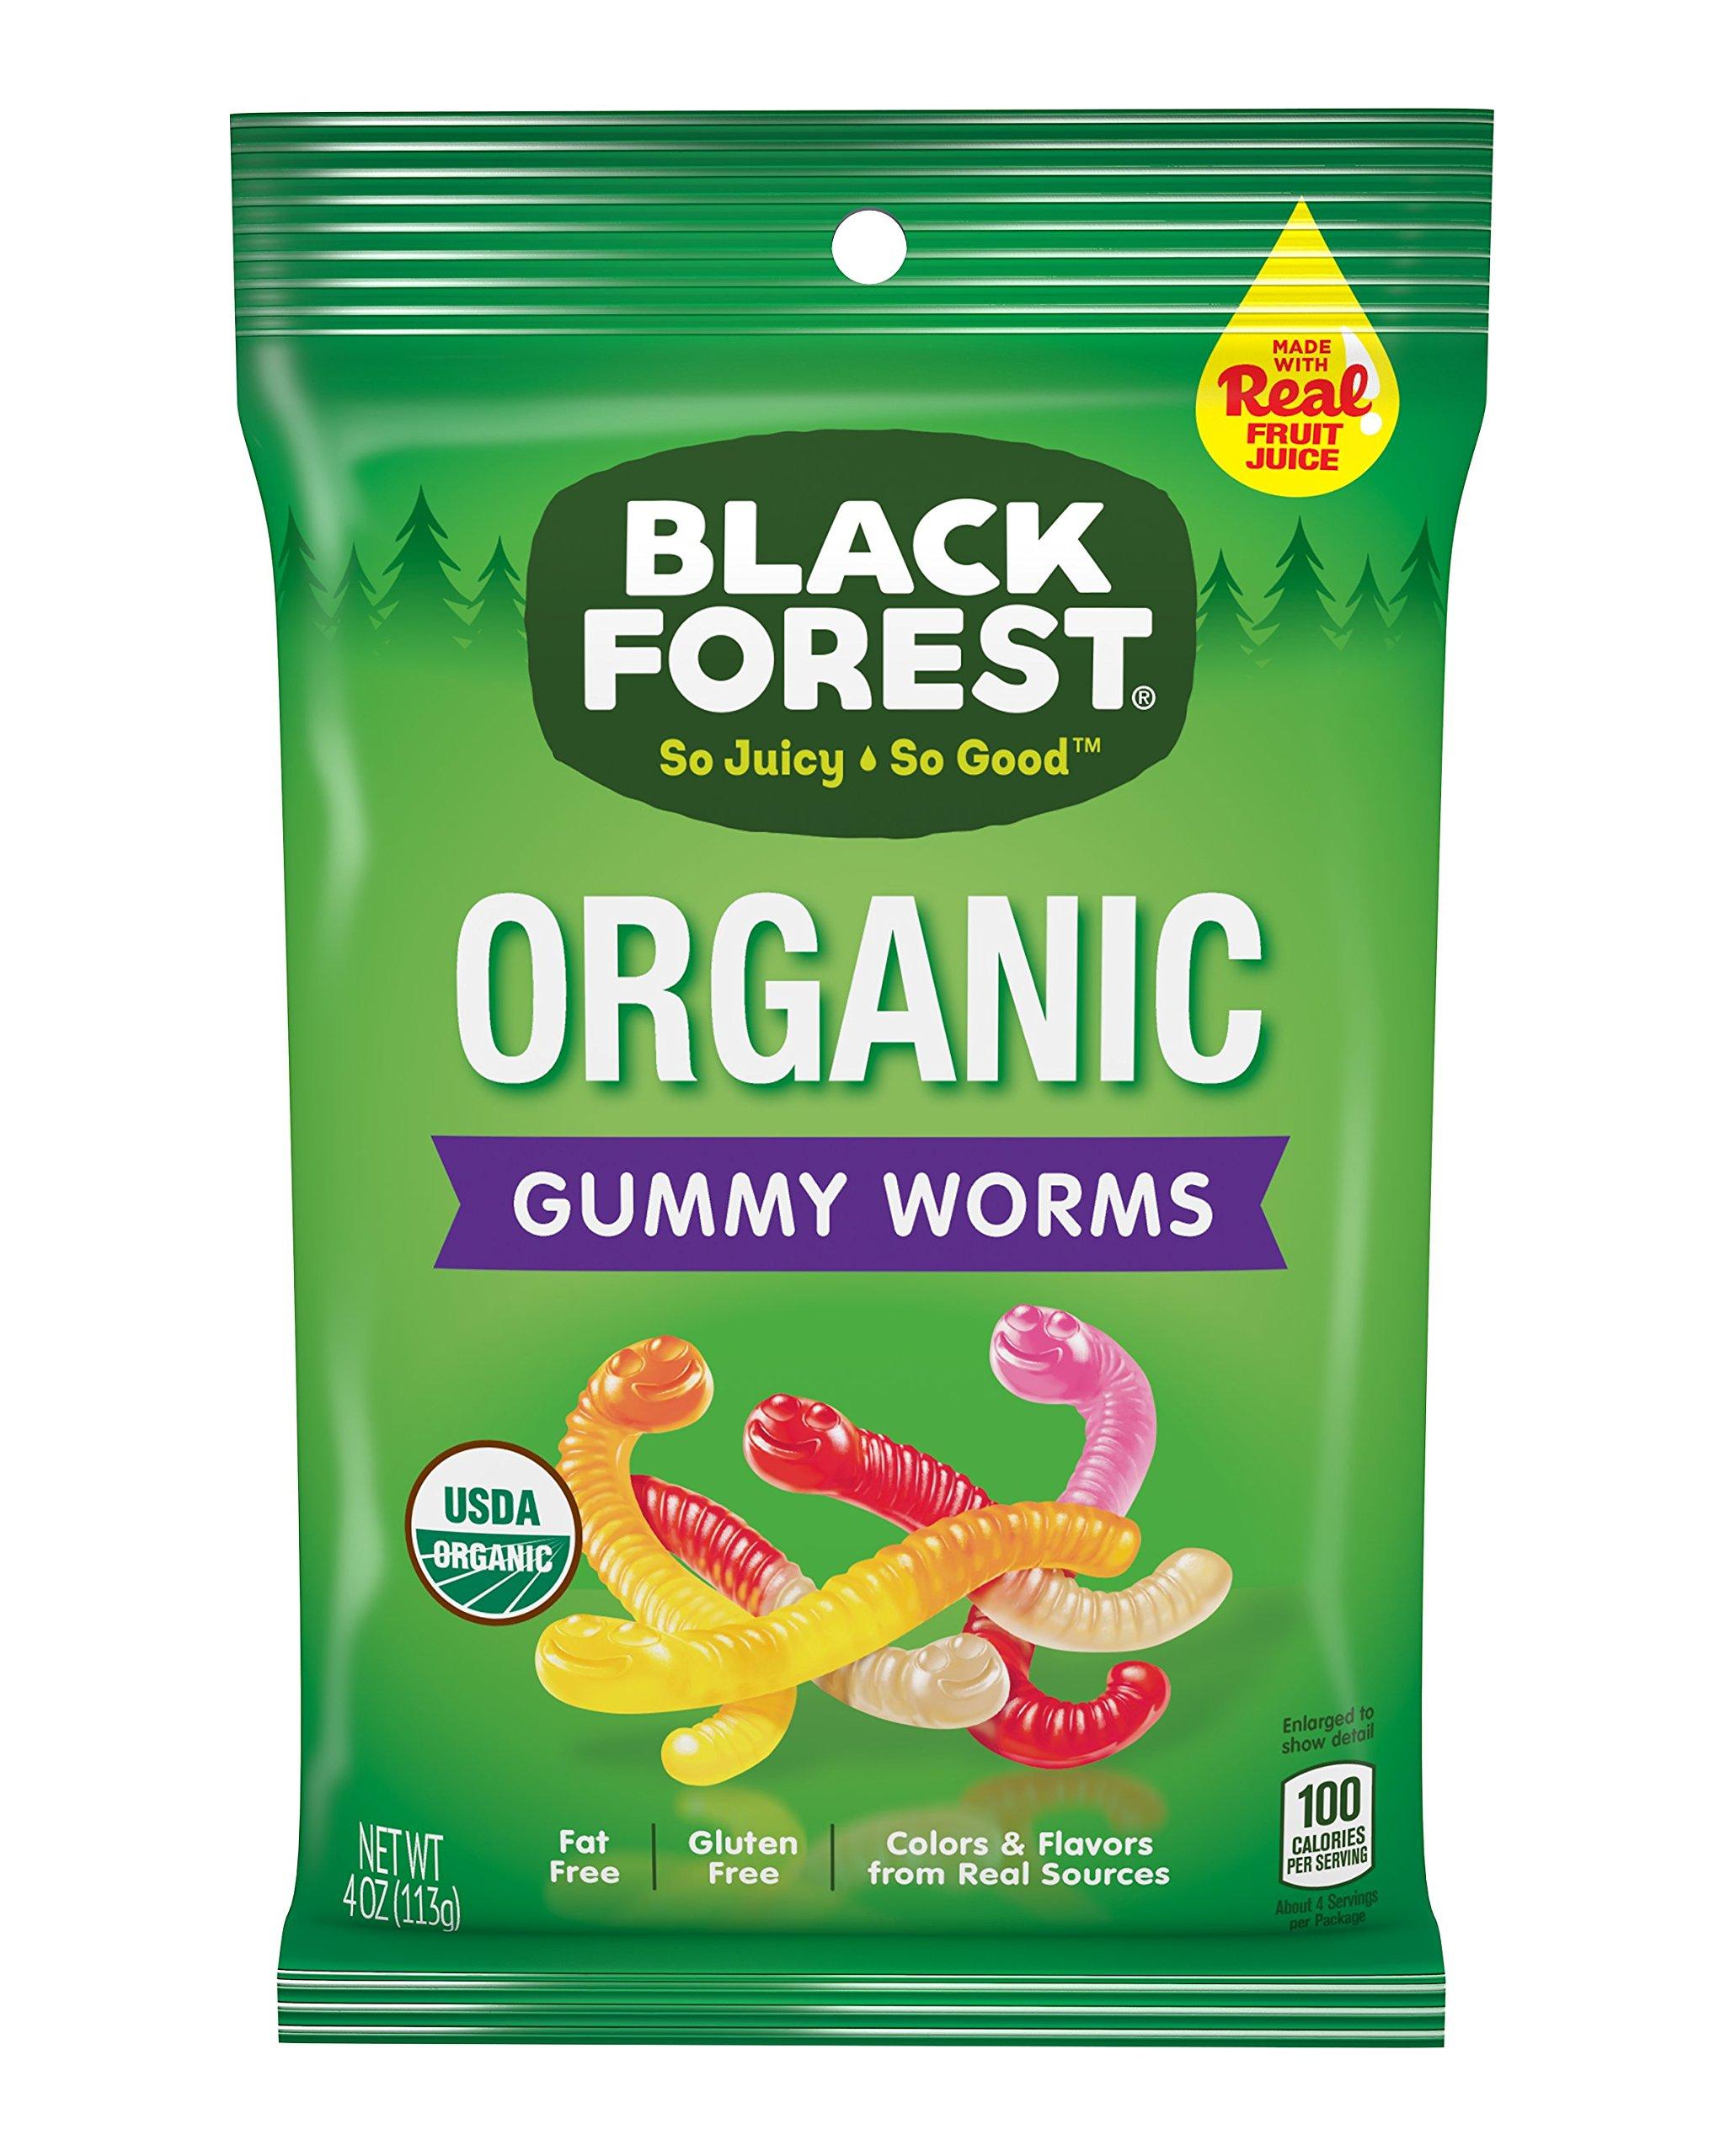 Black Forest Organic Gummy Worms Candy, 4 oz Bag, Pack of 12 by Black Forest Organic